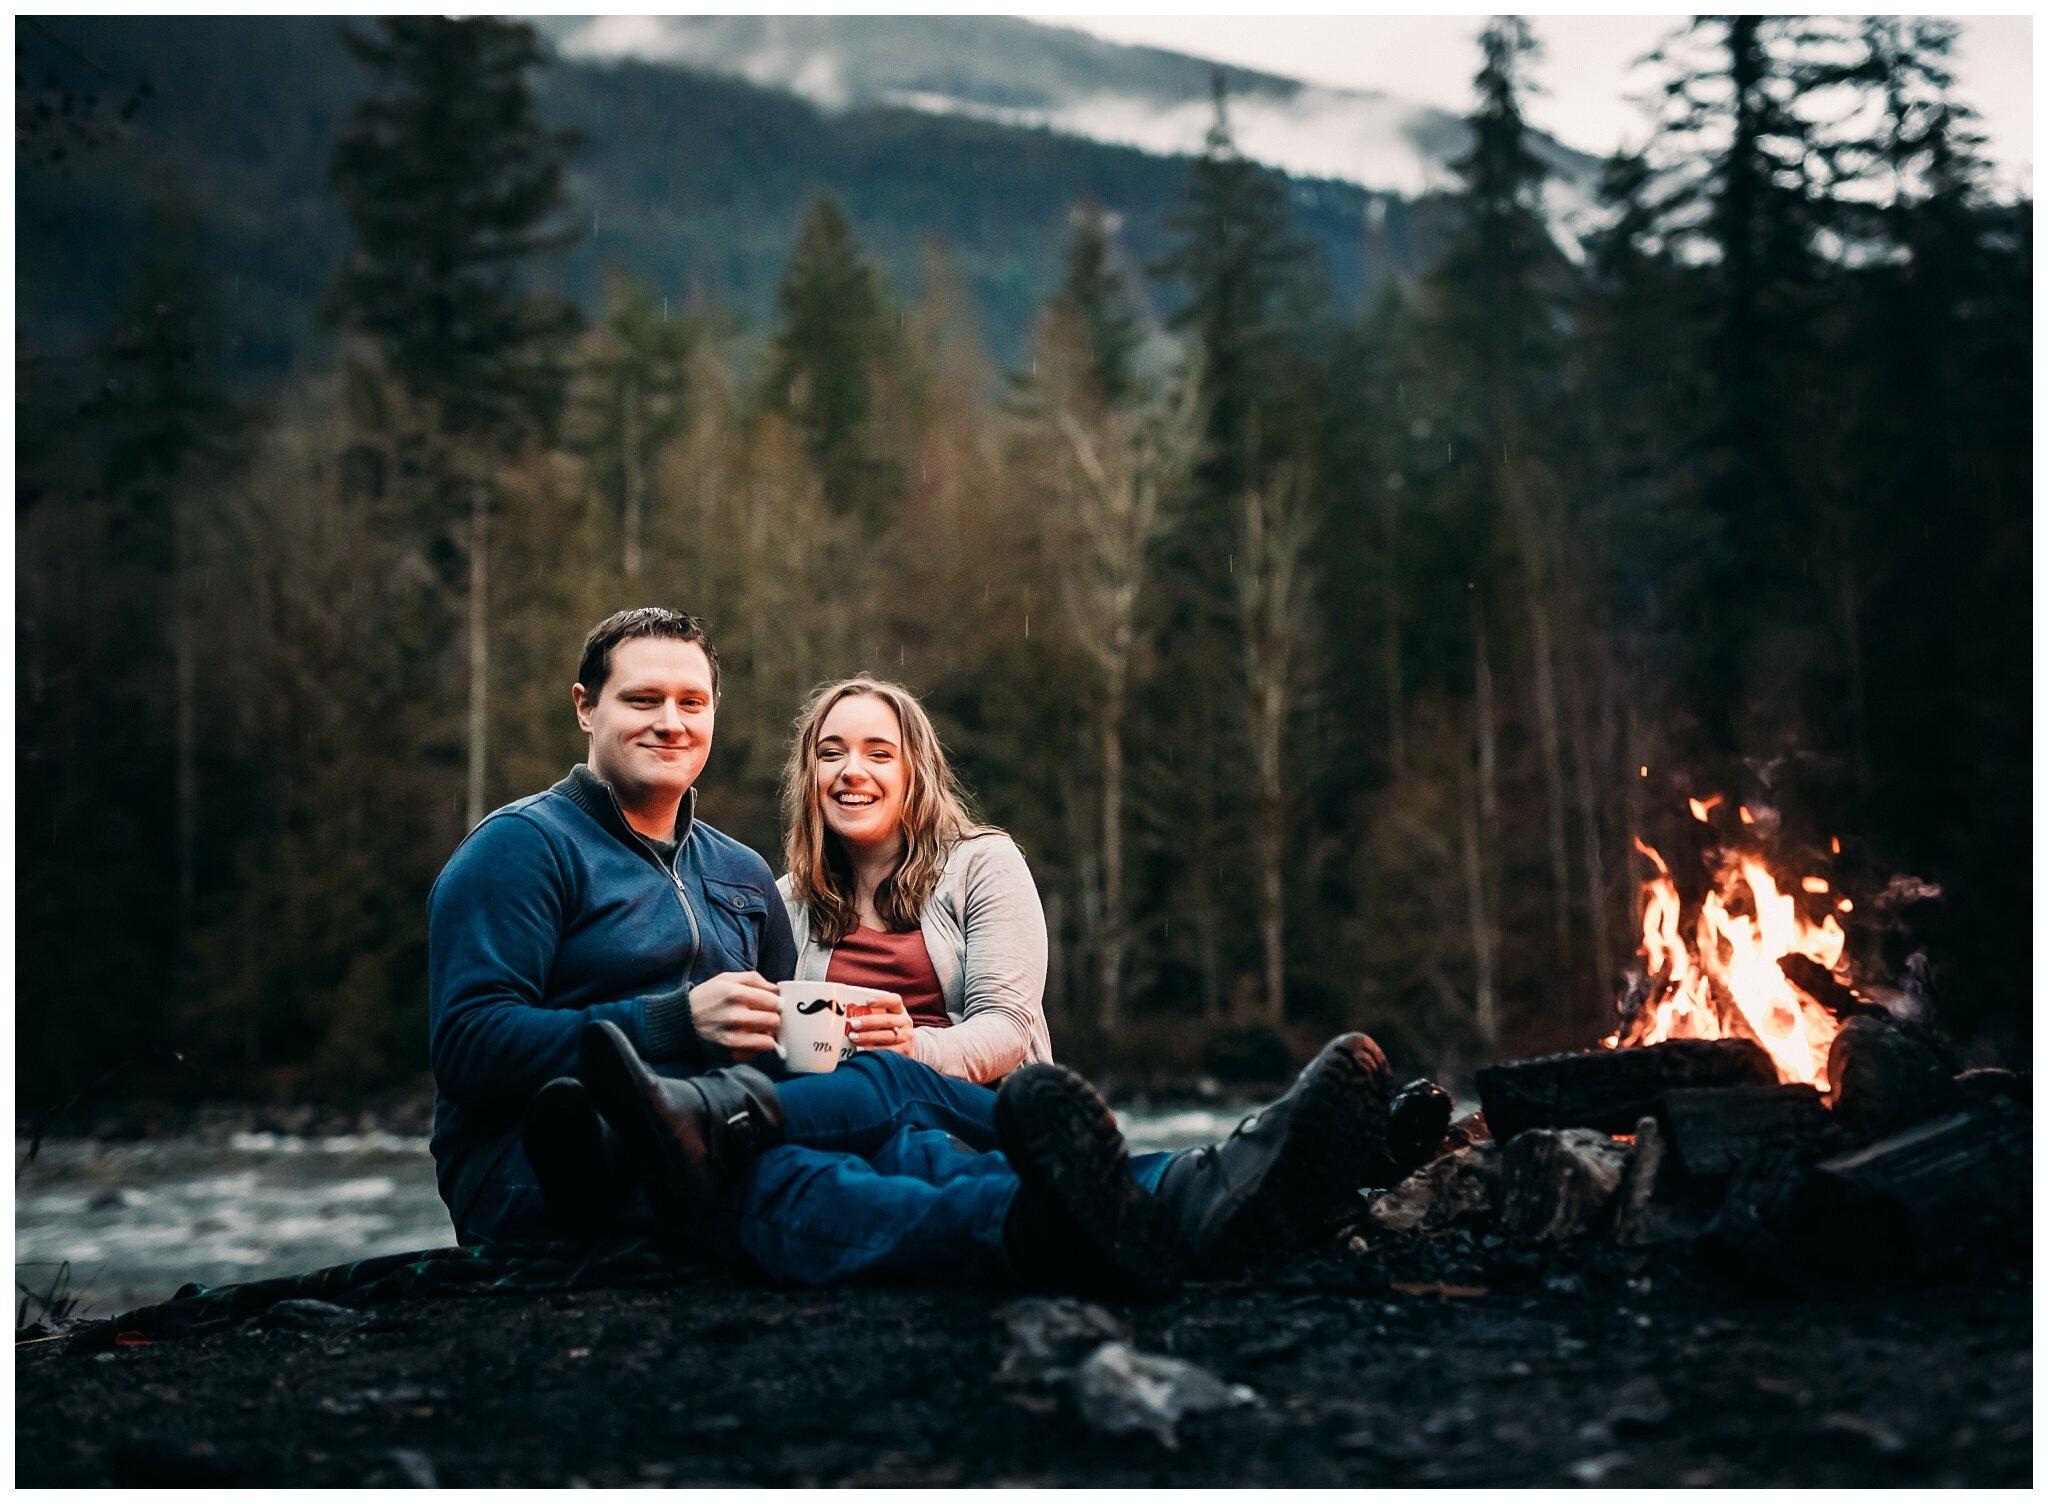 Chilliwack Lake Rainy Winter Engagement Photography Session Couples Photographer_0019.jpg